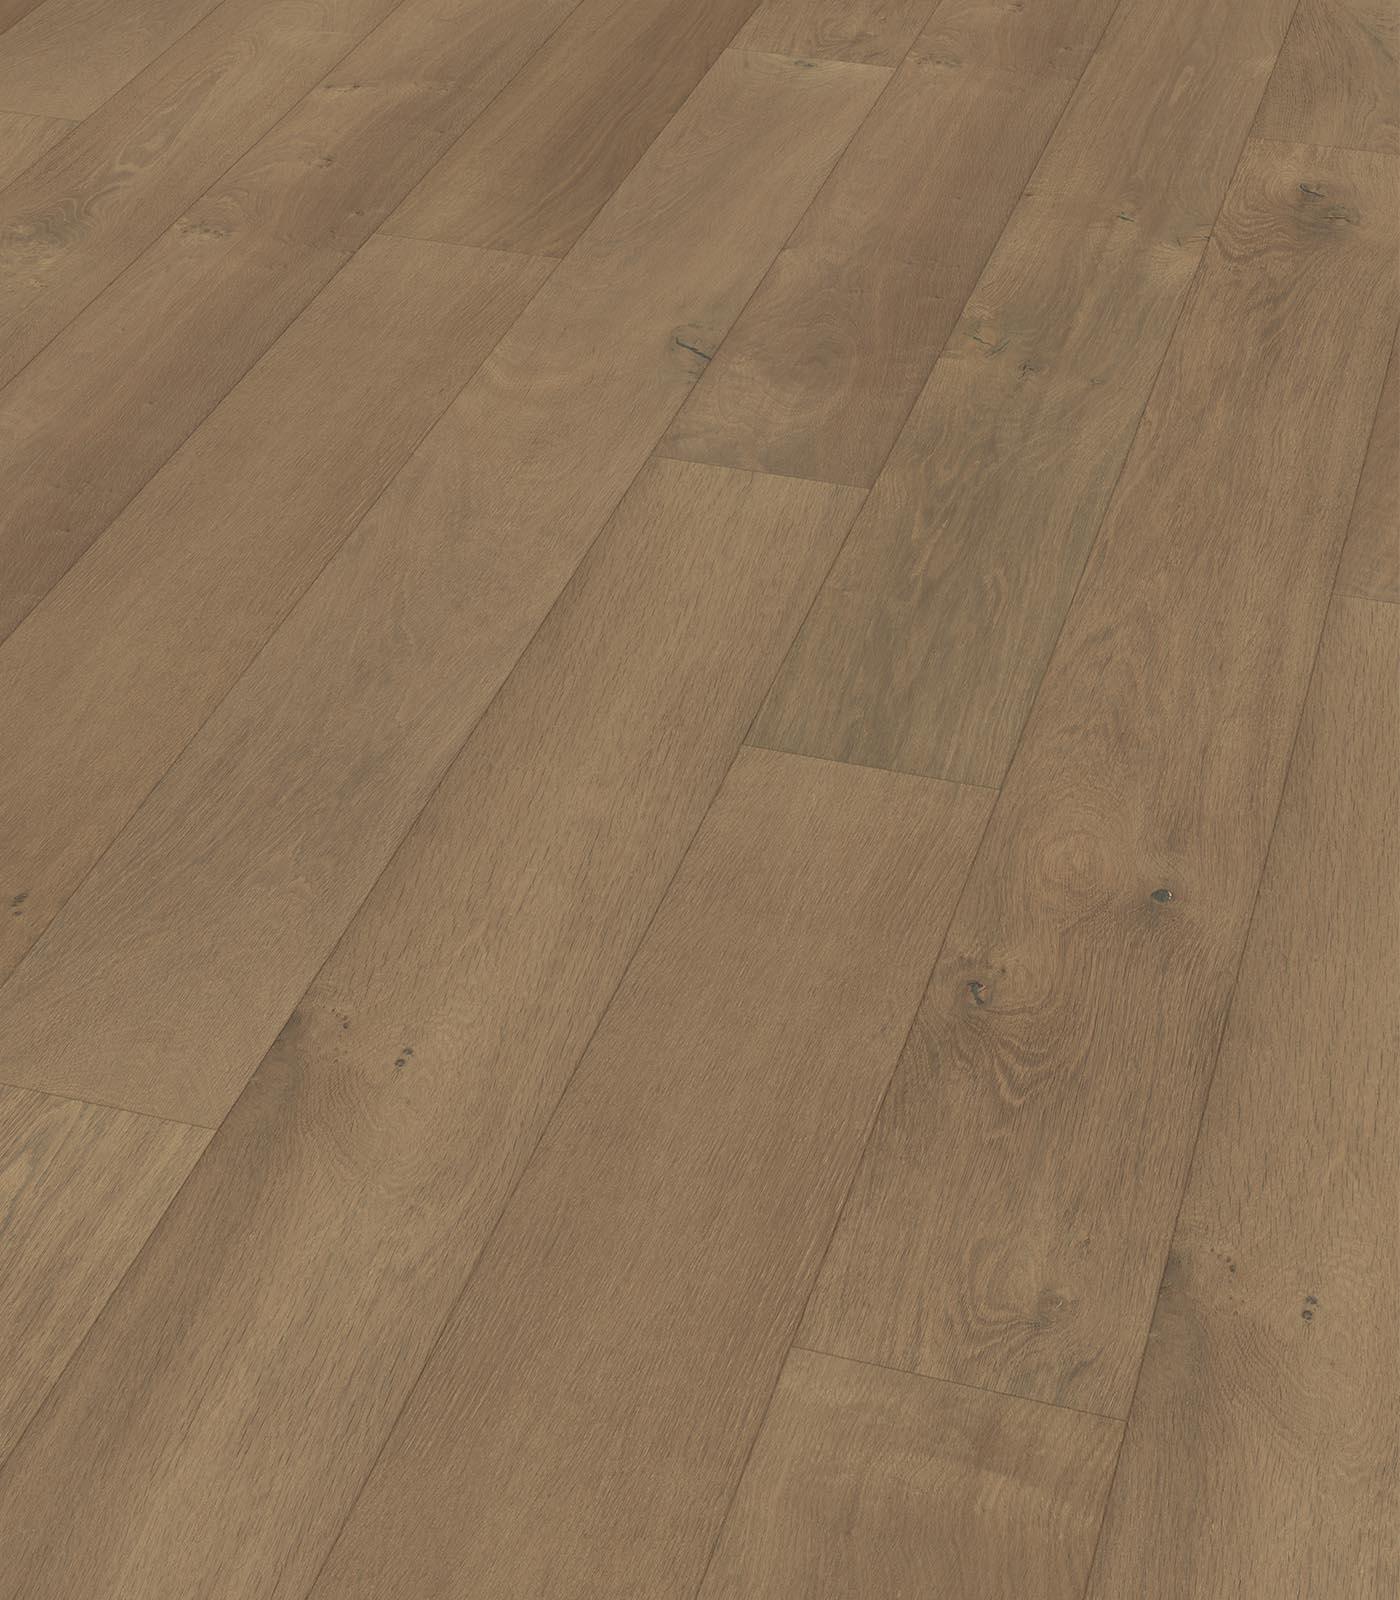 Verbier-Lifestyle Collection-European Oak floors-angle